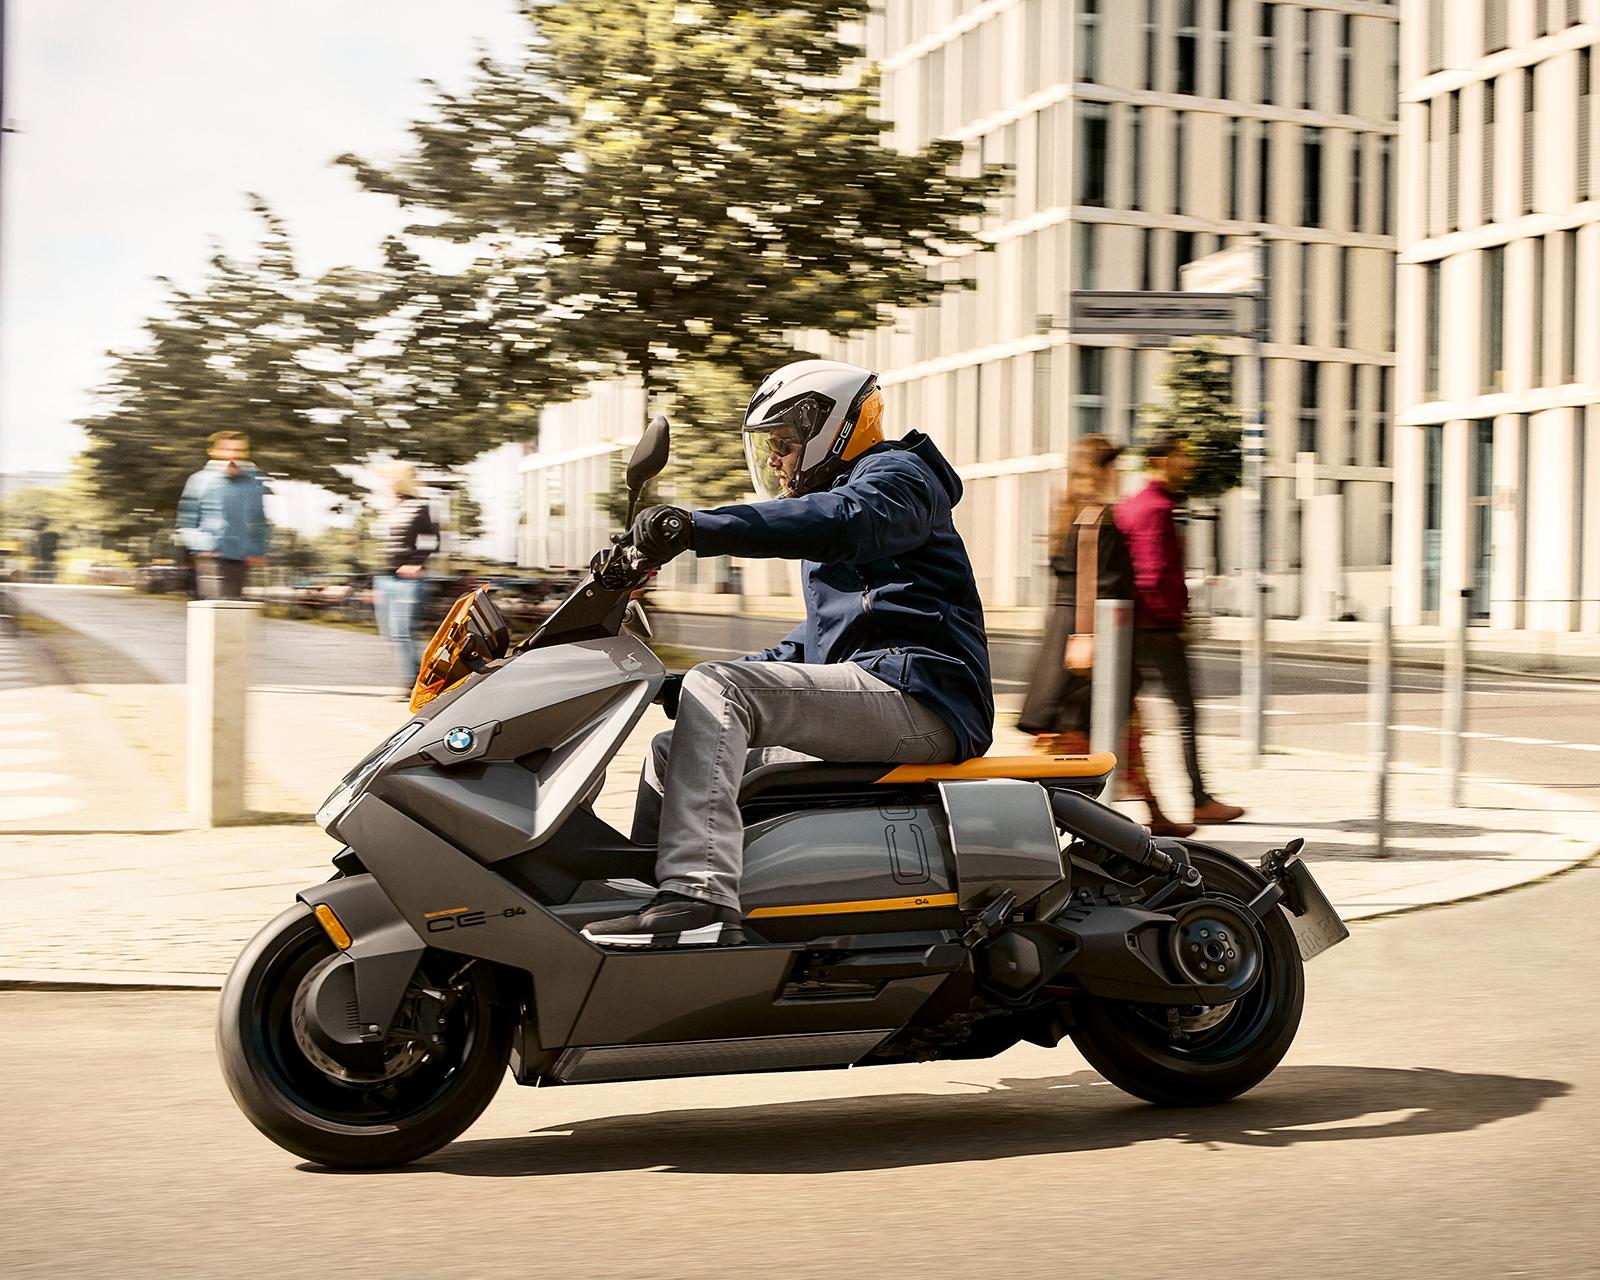 A man rides the BMW CE 04 on a city street